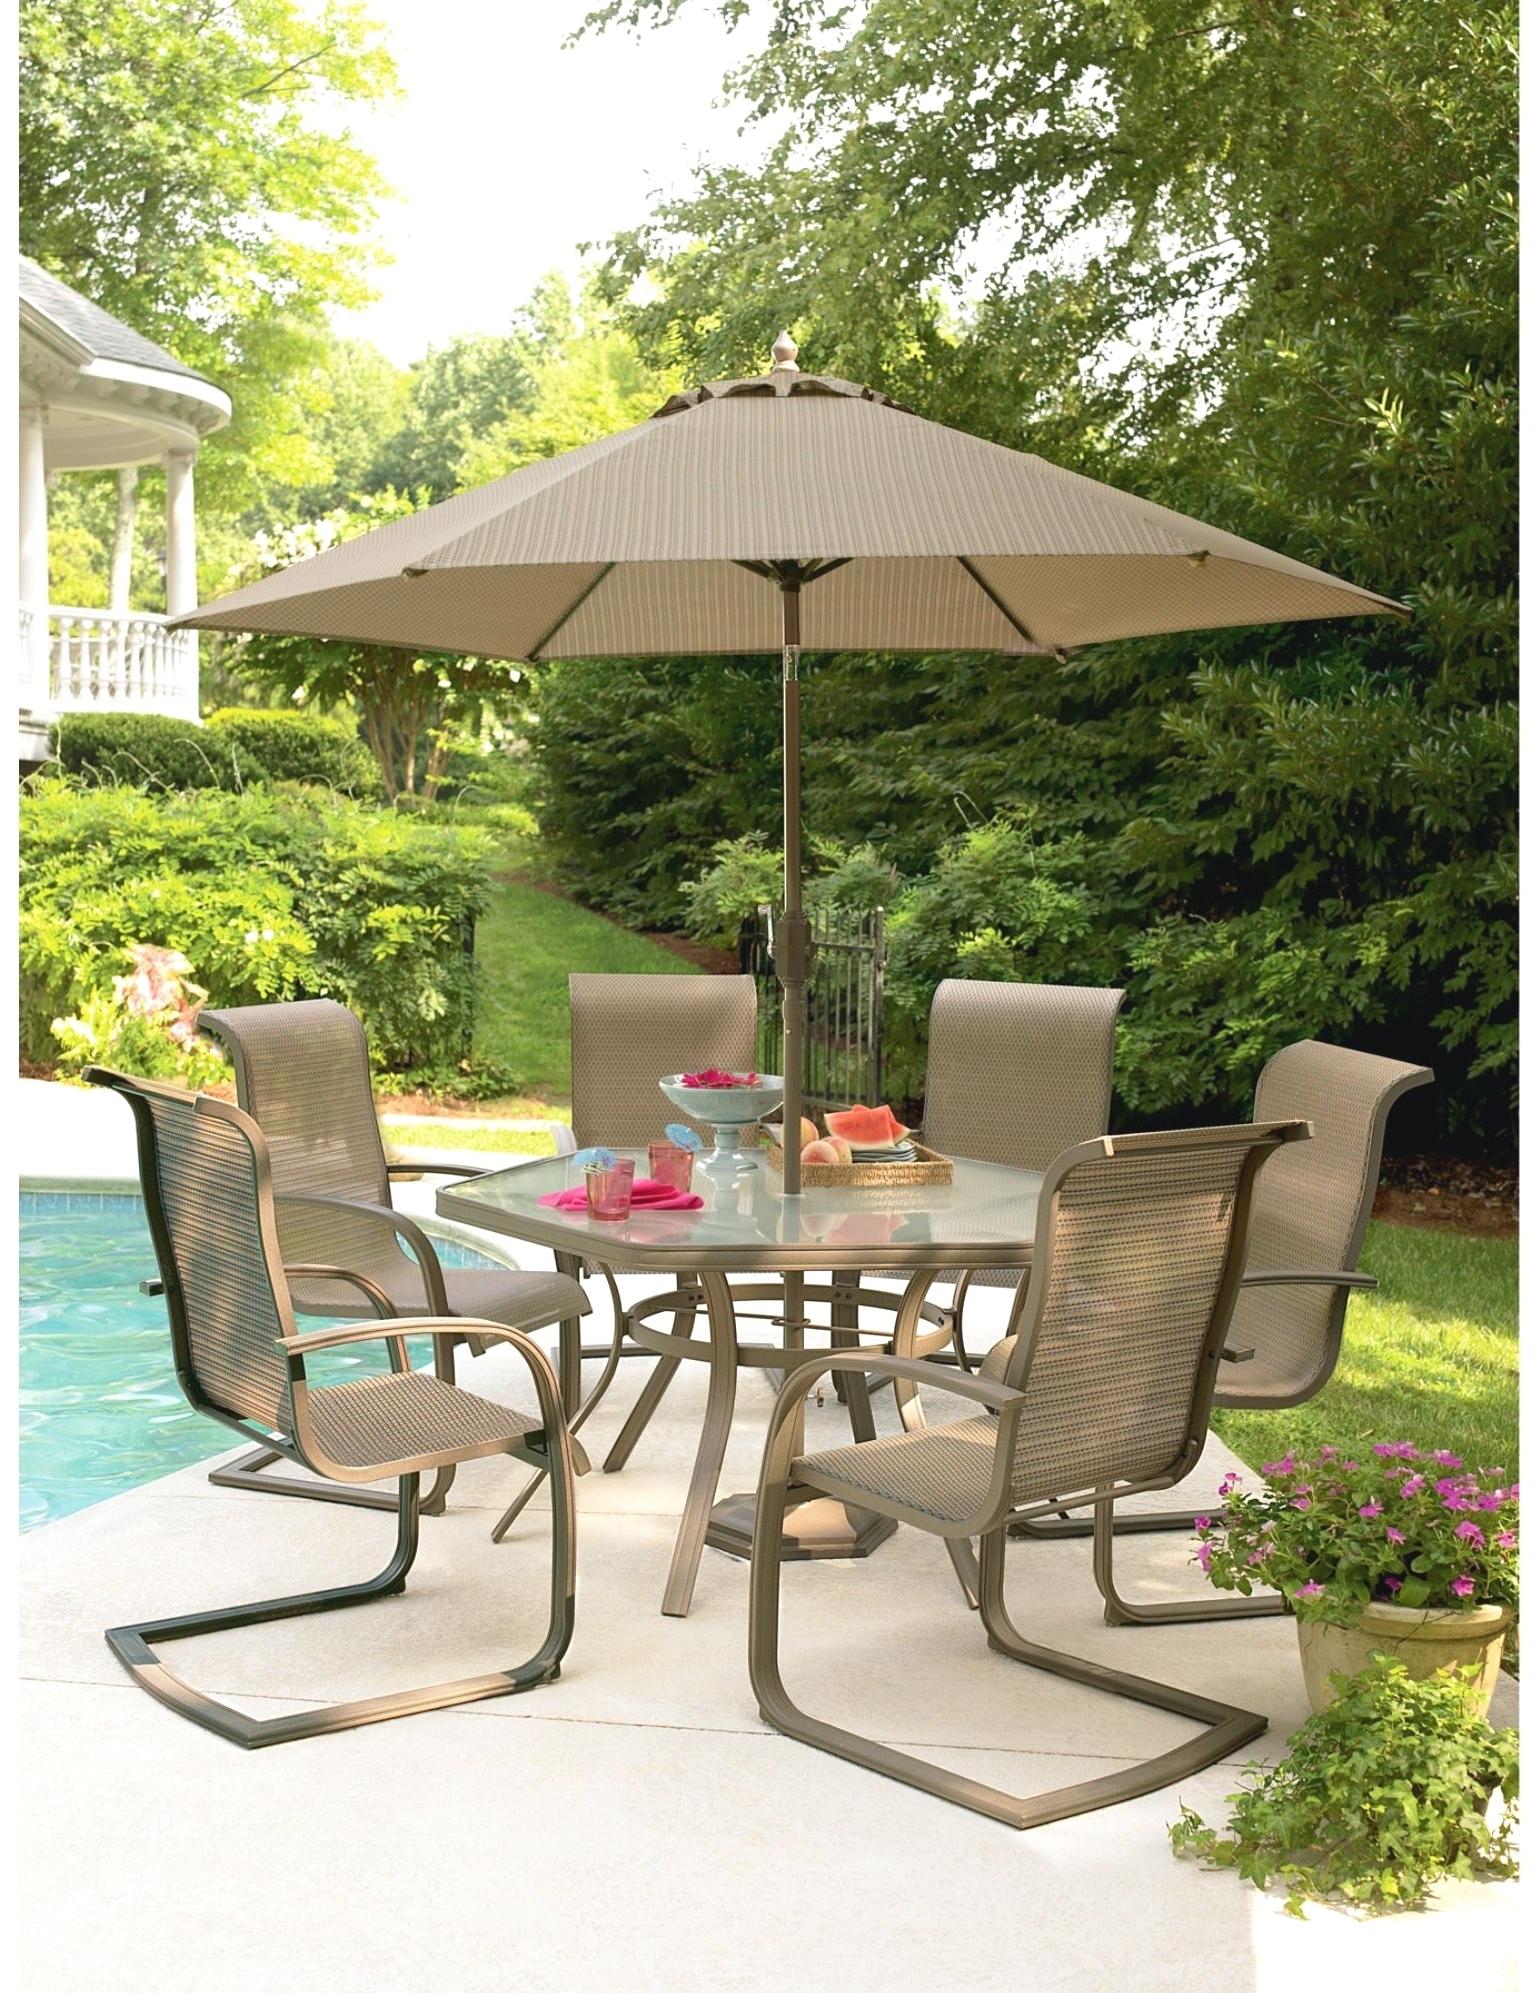 2018 Kmart Conversation Sets Patio Patios Umbrellas Fornspiring Outdoor In Martha Stewart Conversation Patio Sets (View 11 of 15)